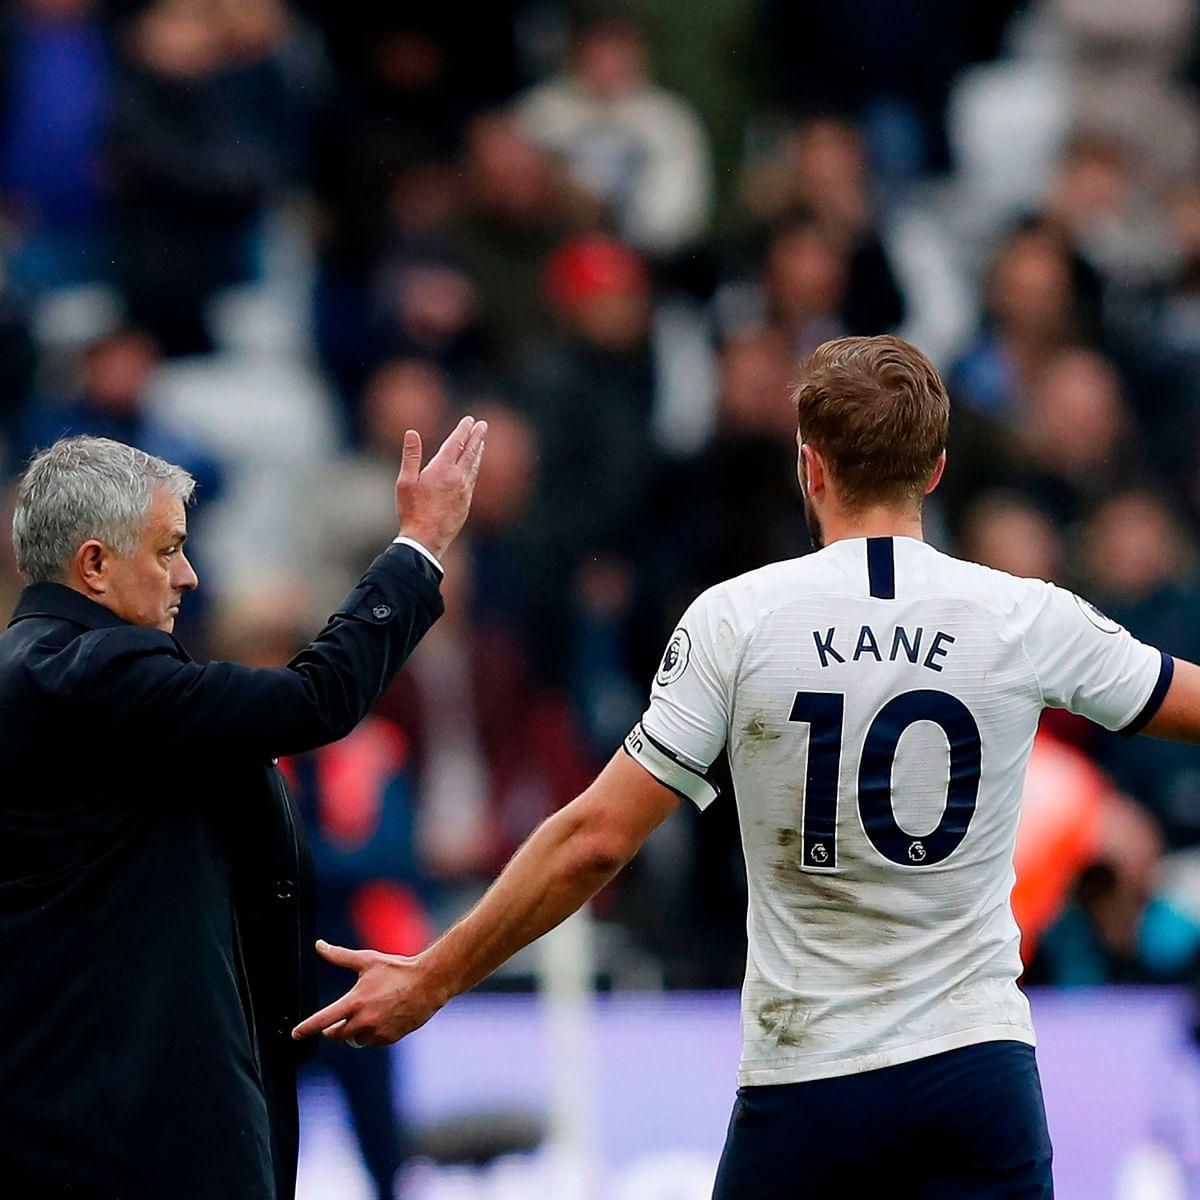 Premier League: Harry Kane's late strike helps Tottenham defeat West Brom